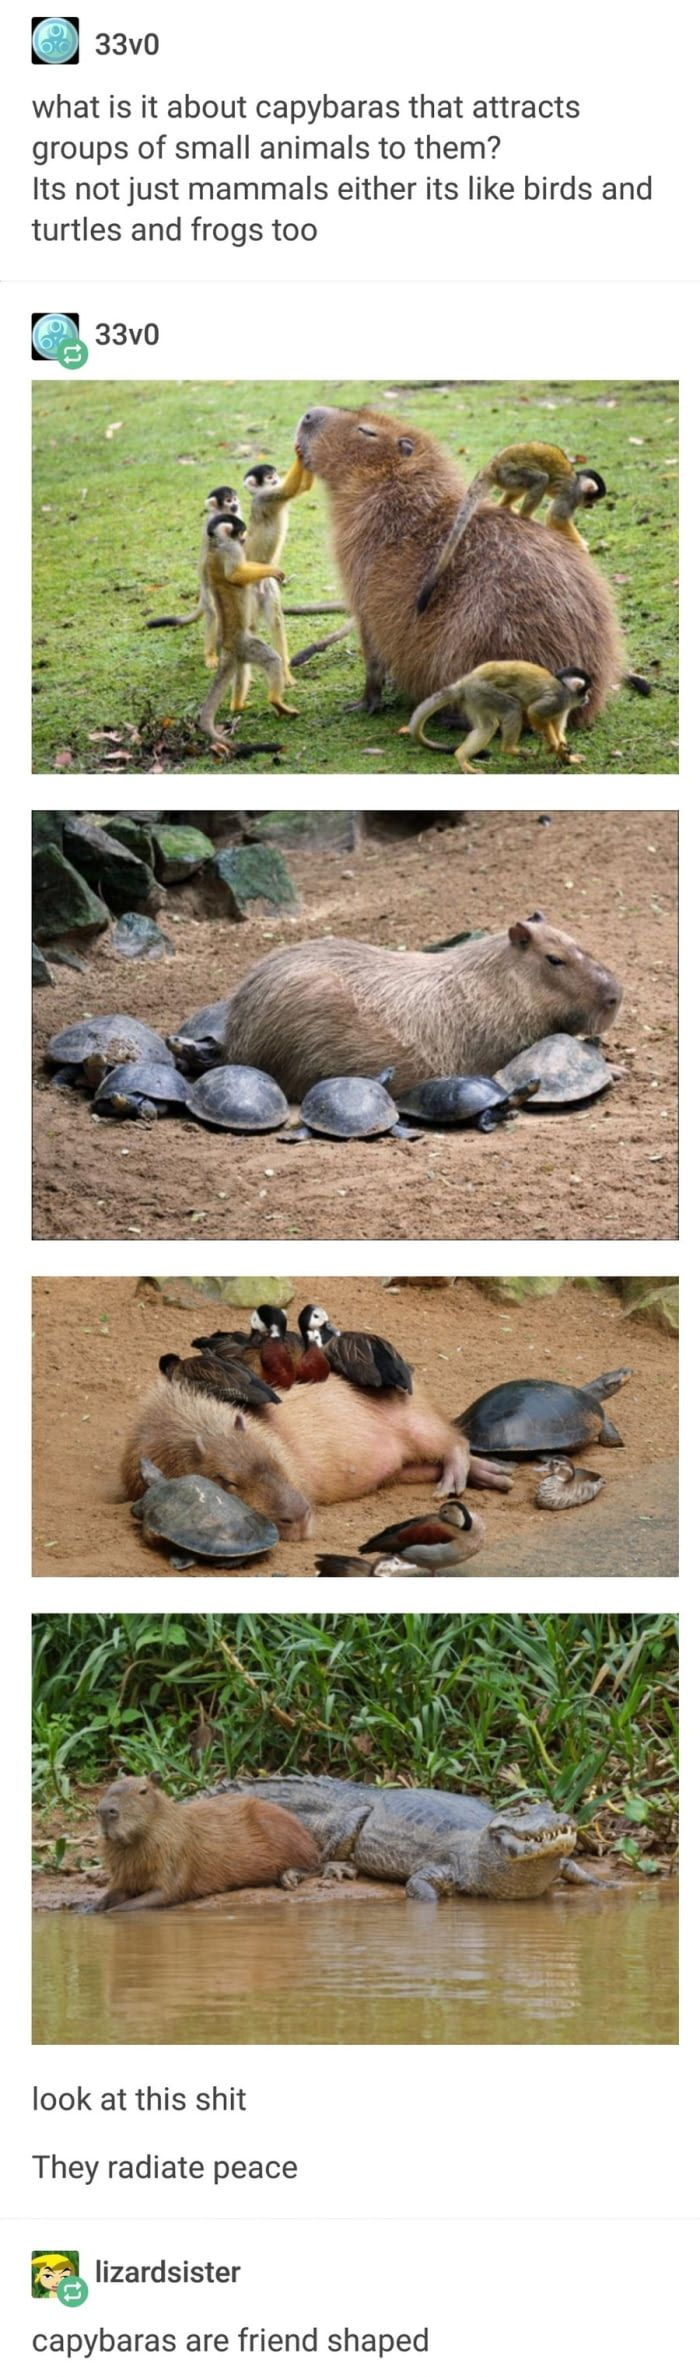 Capybara,the most friendly animal